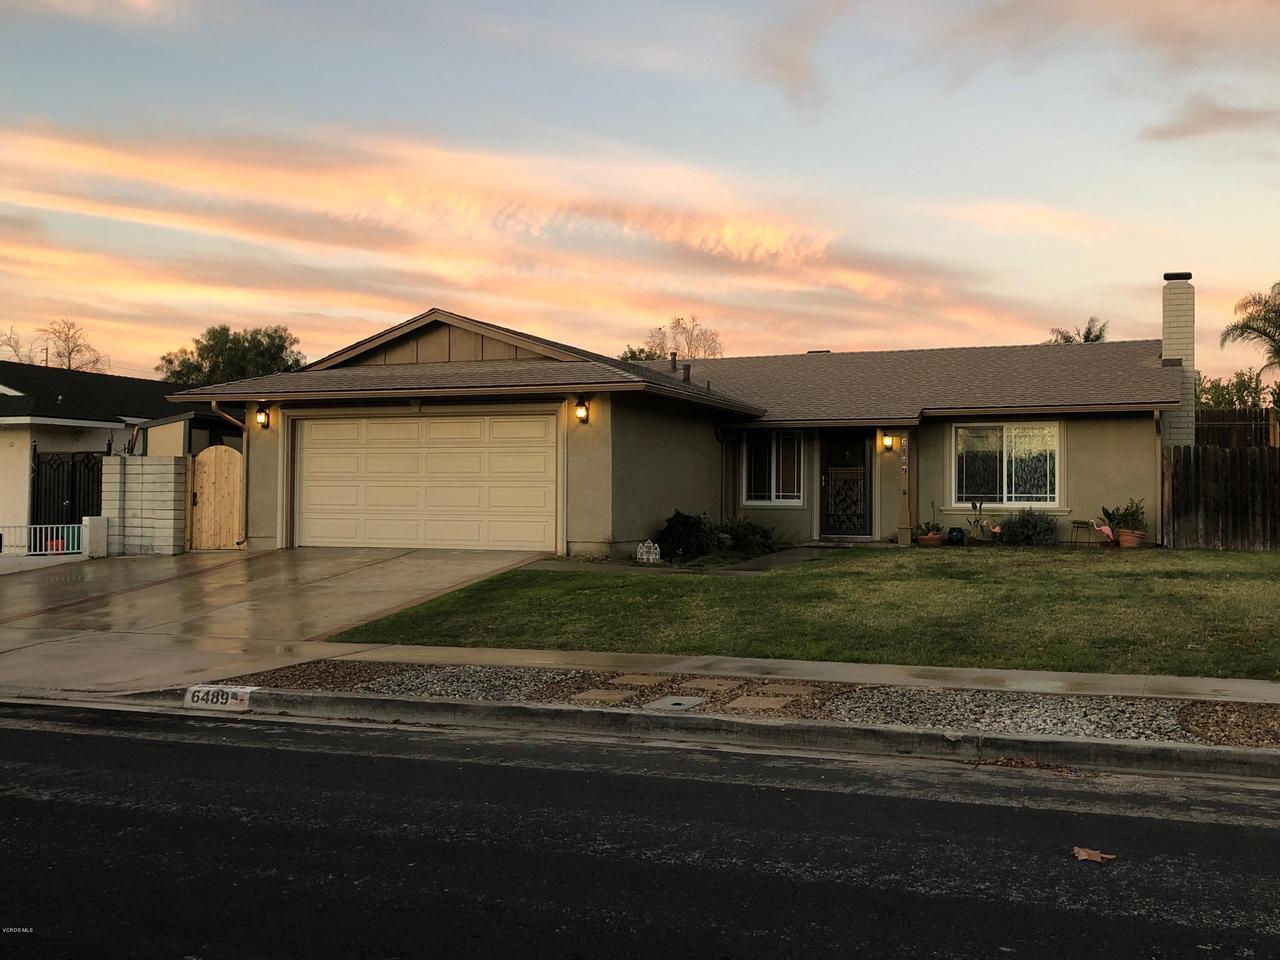 6489 DUKE, Moorpark, CA 93021 - A_Home Front 3